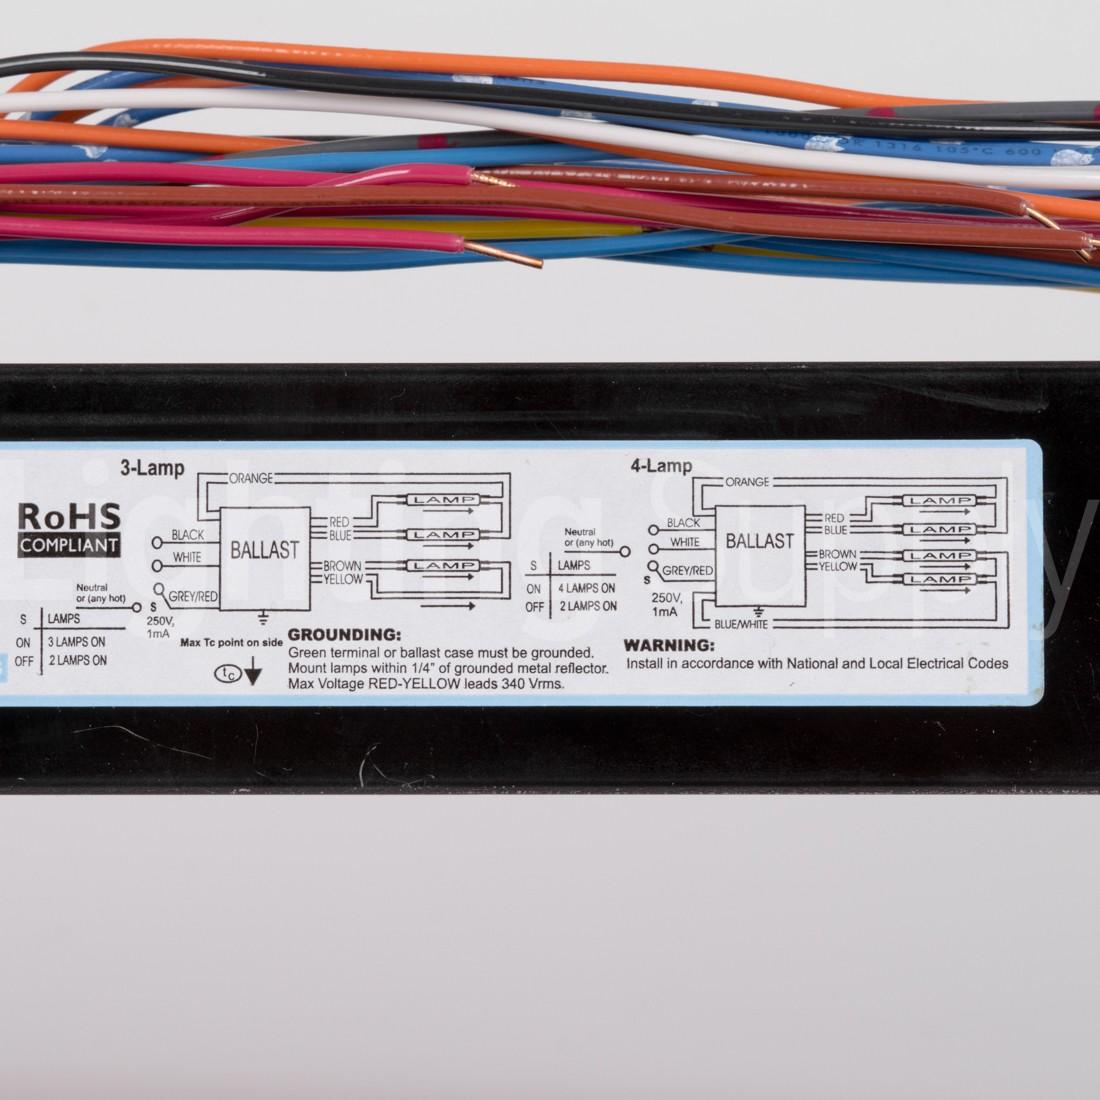 Advance ICN-4S54-90C-2LS-G Electronic Fluorescent Programmed